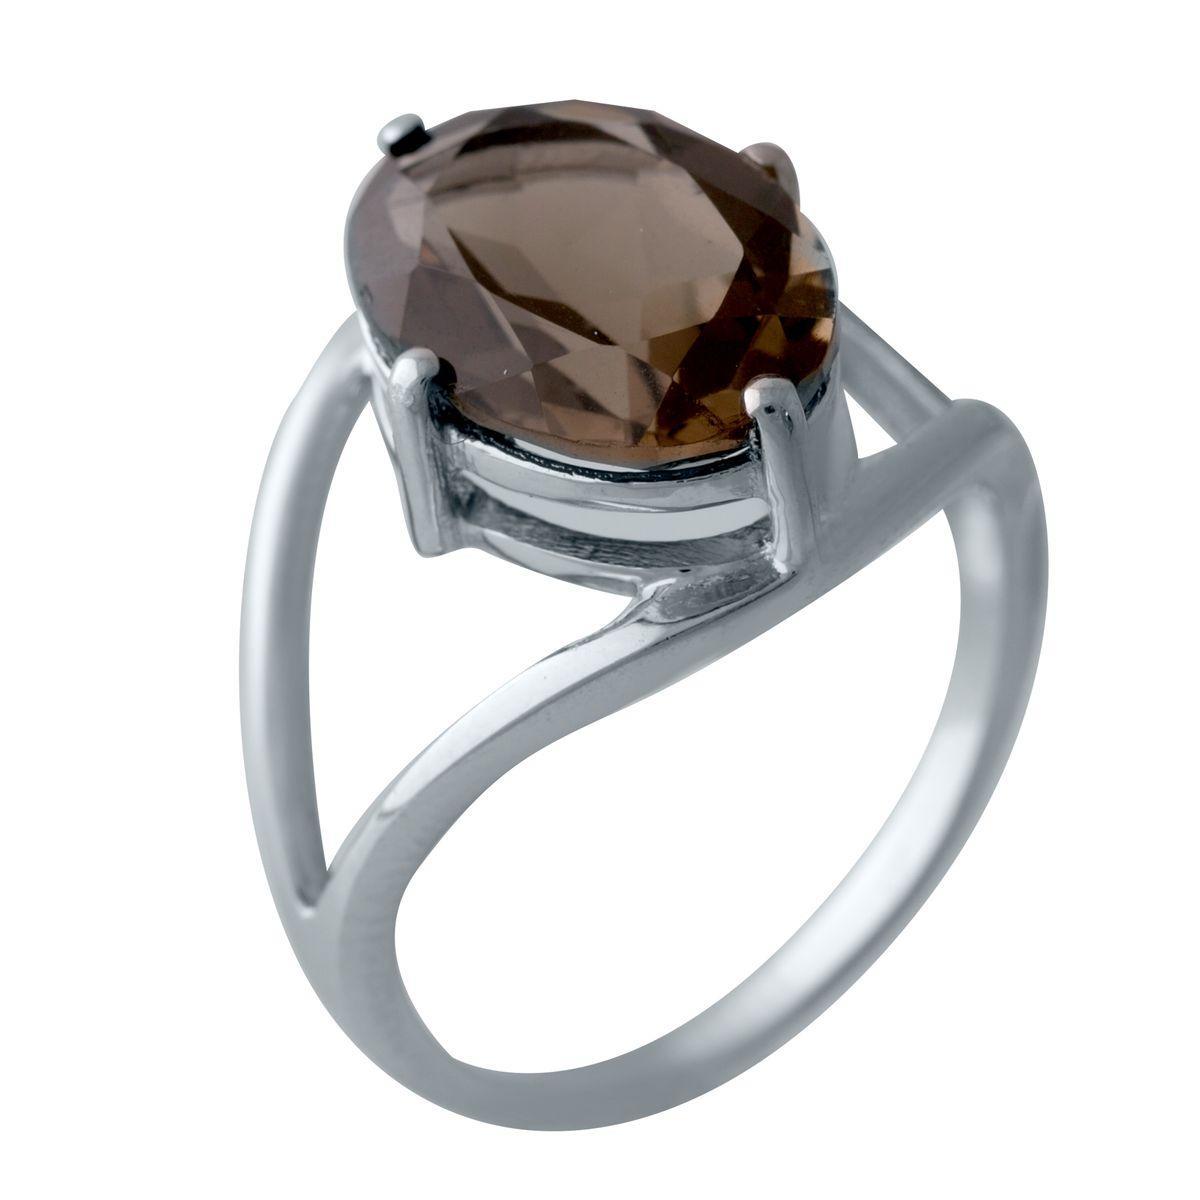 Серебряные серьги DreamJewelry с натуральным раухтопазом (димчатим кварцем) (2025719)